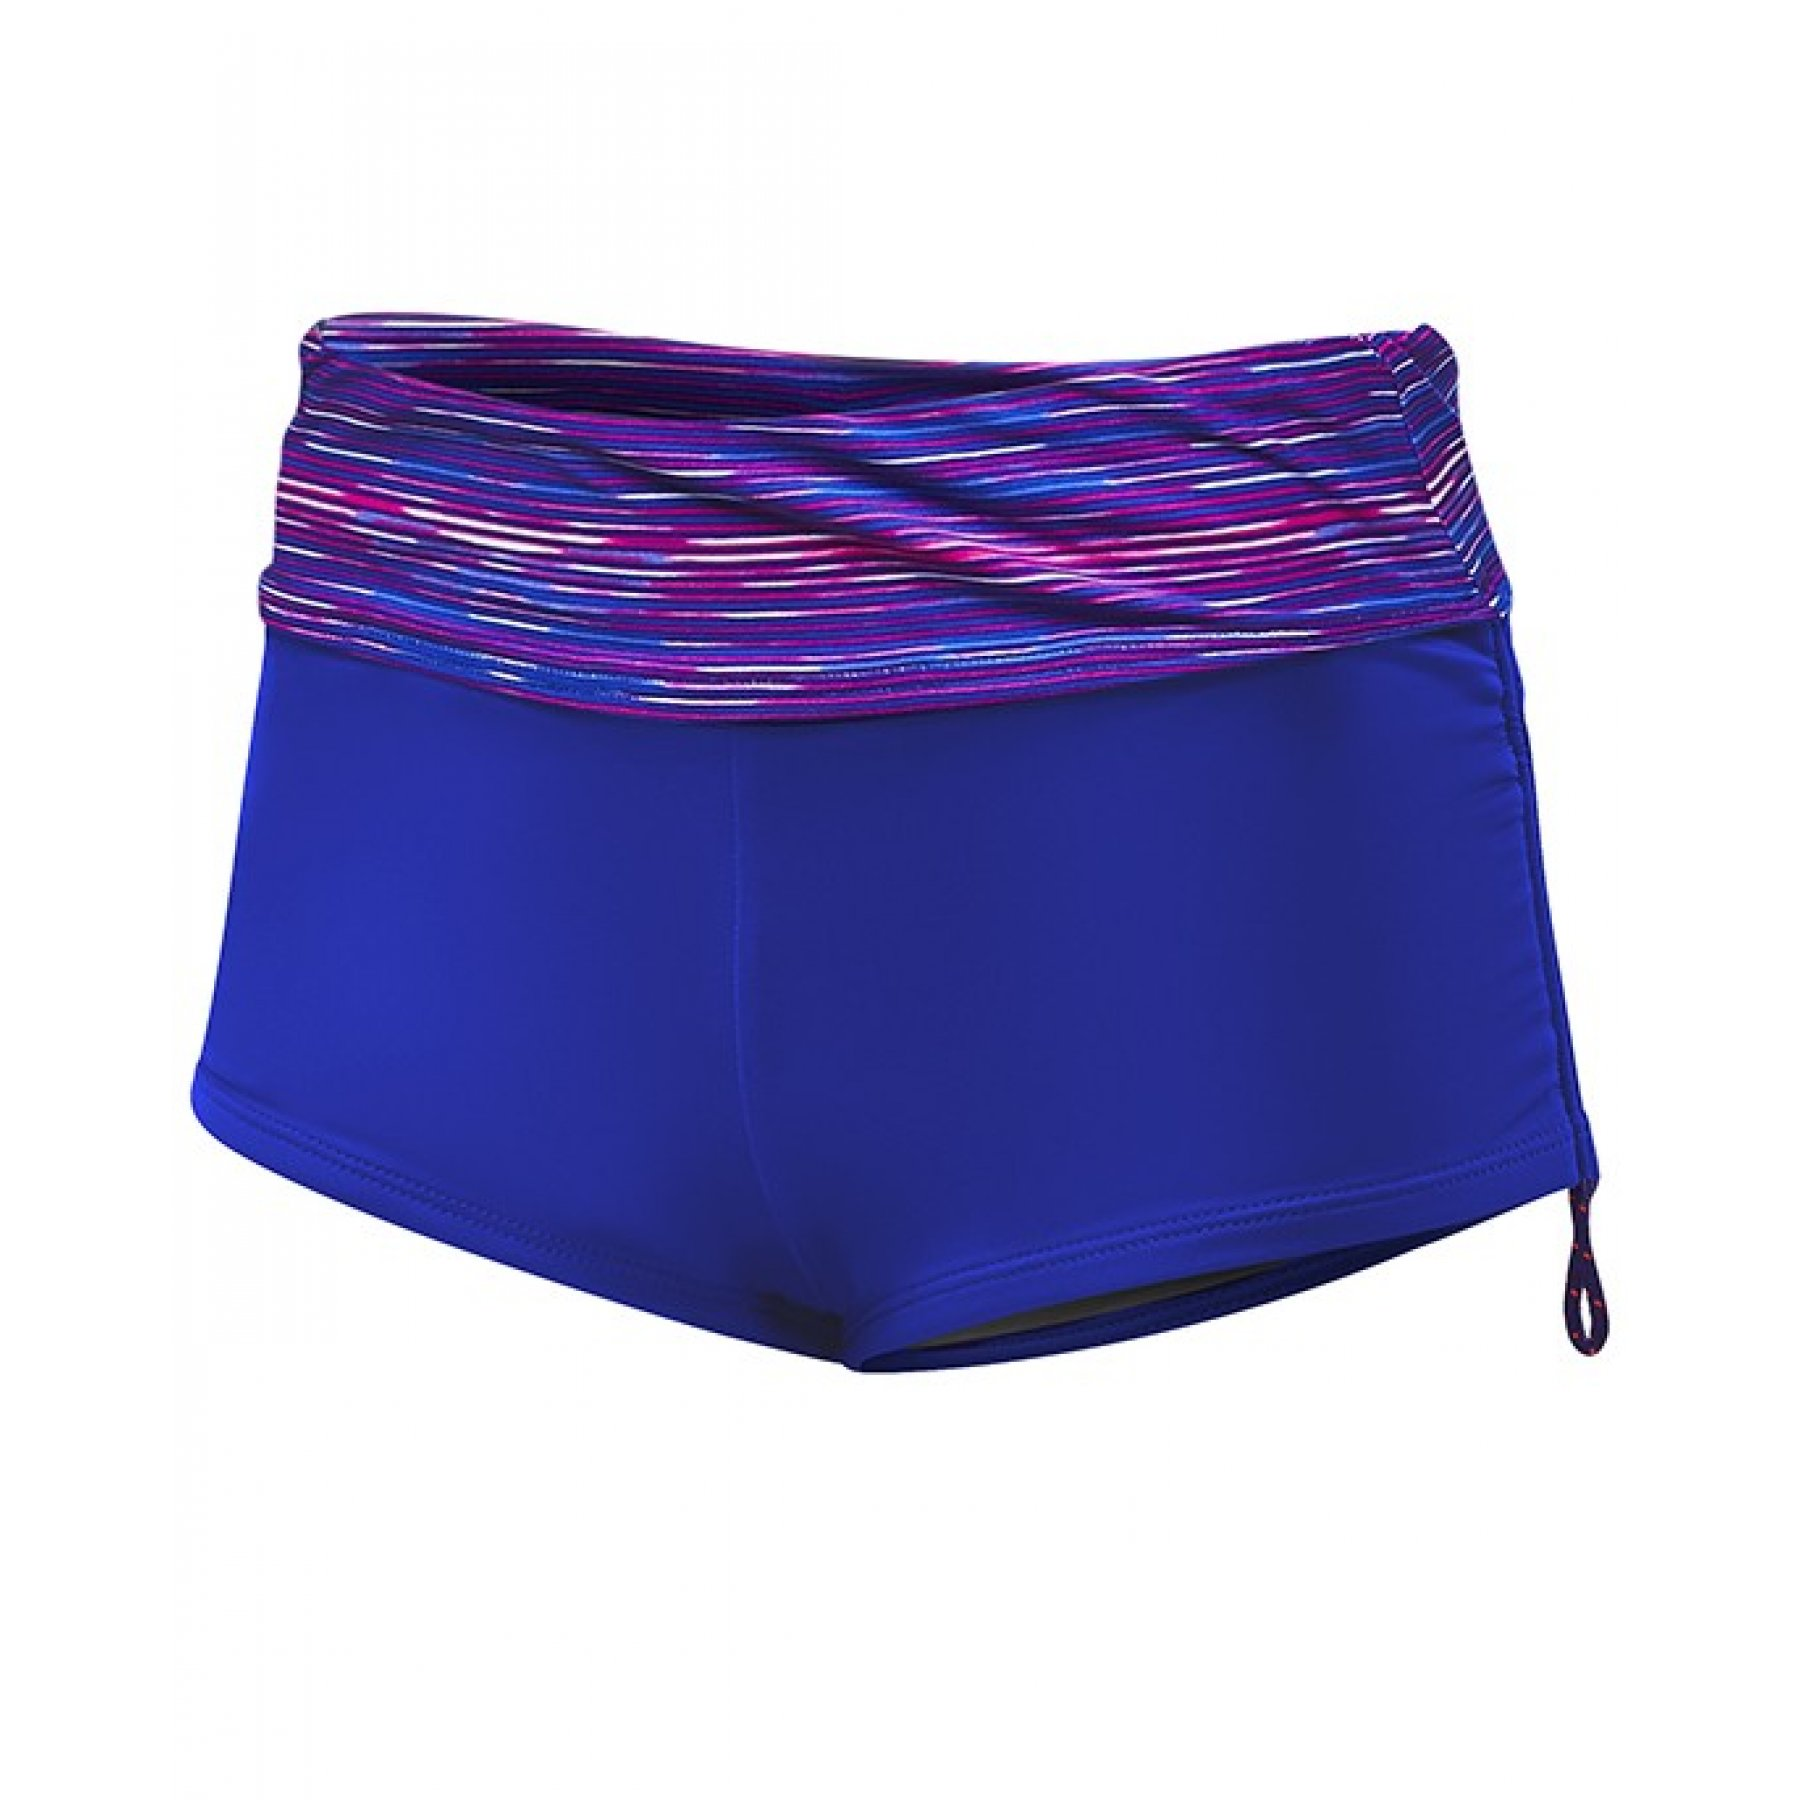 ba43d6a3c876 TYR Cyprus Della boyshort pink-purple. Click Image for Gallery